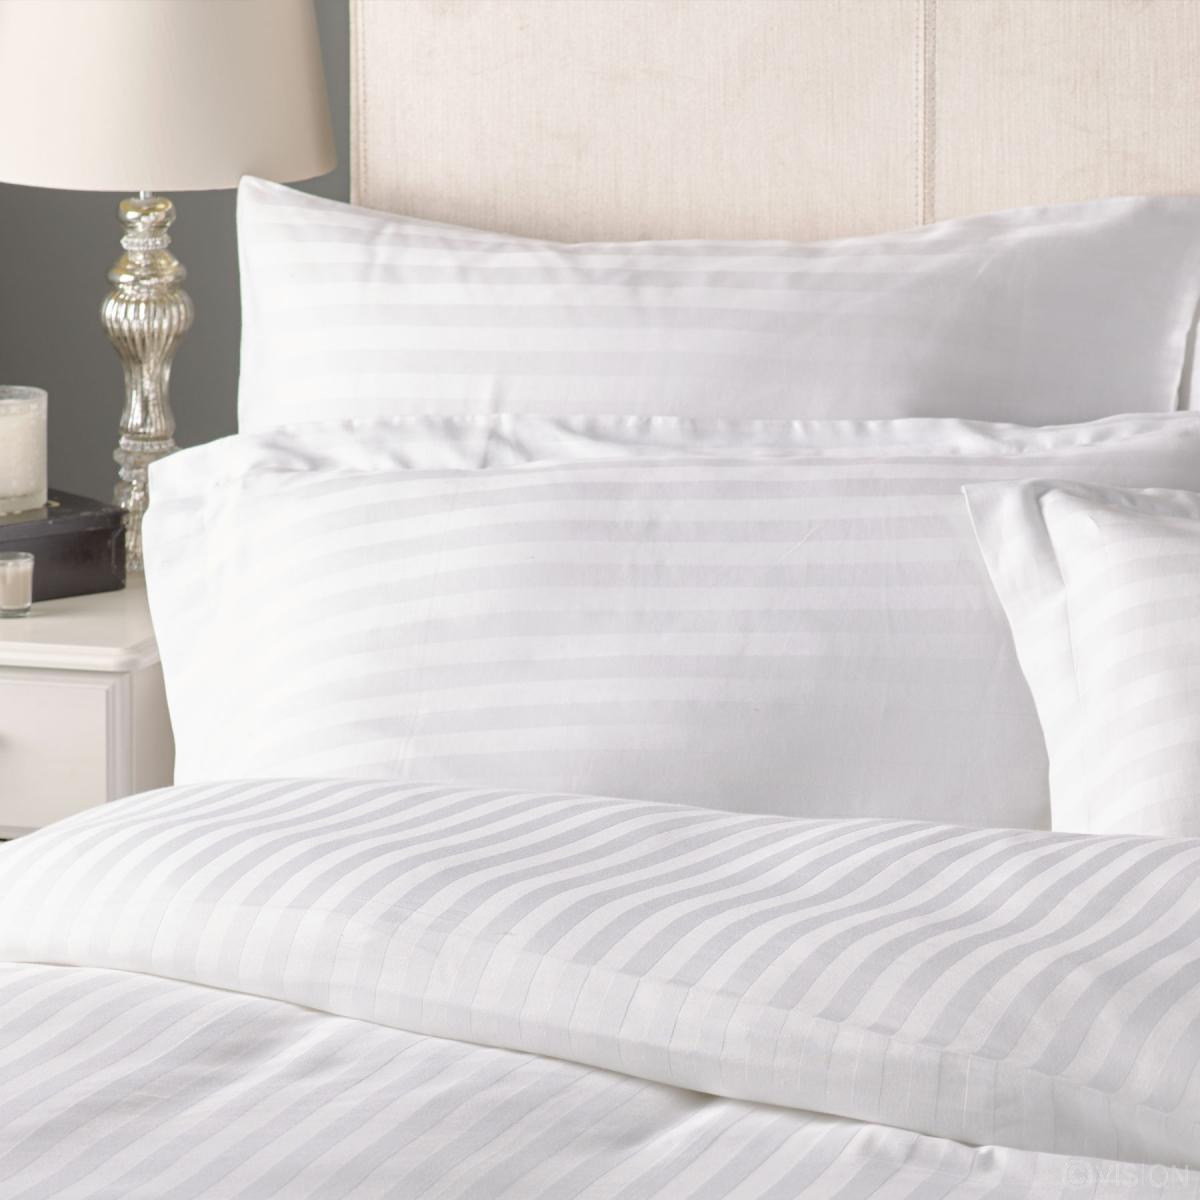 Buy Satin Pillowcase Nz: Buy Bulk Pillowcases For Hotels & Hospitality